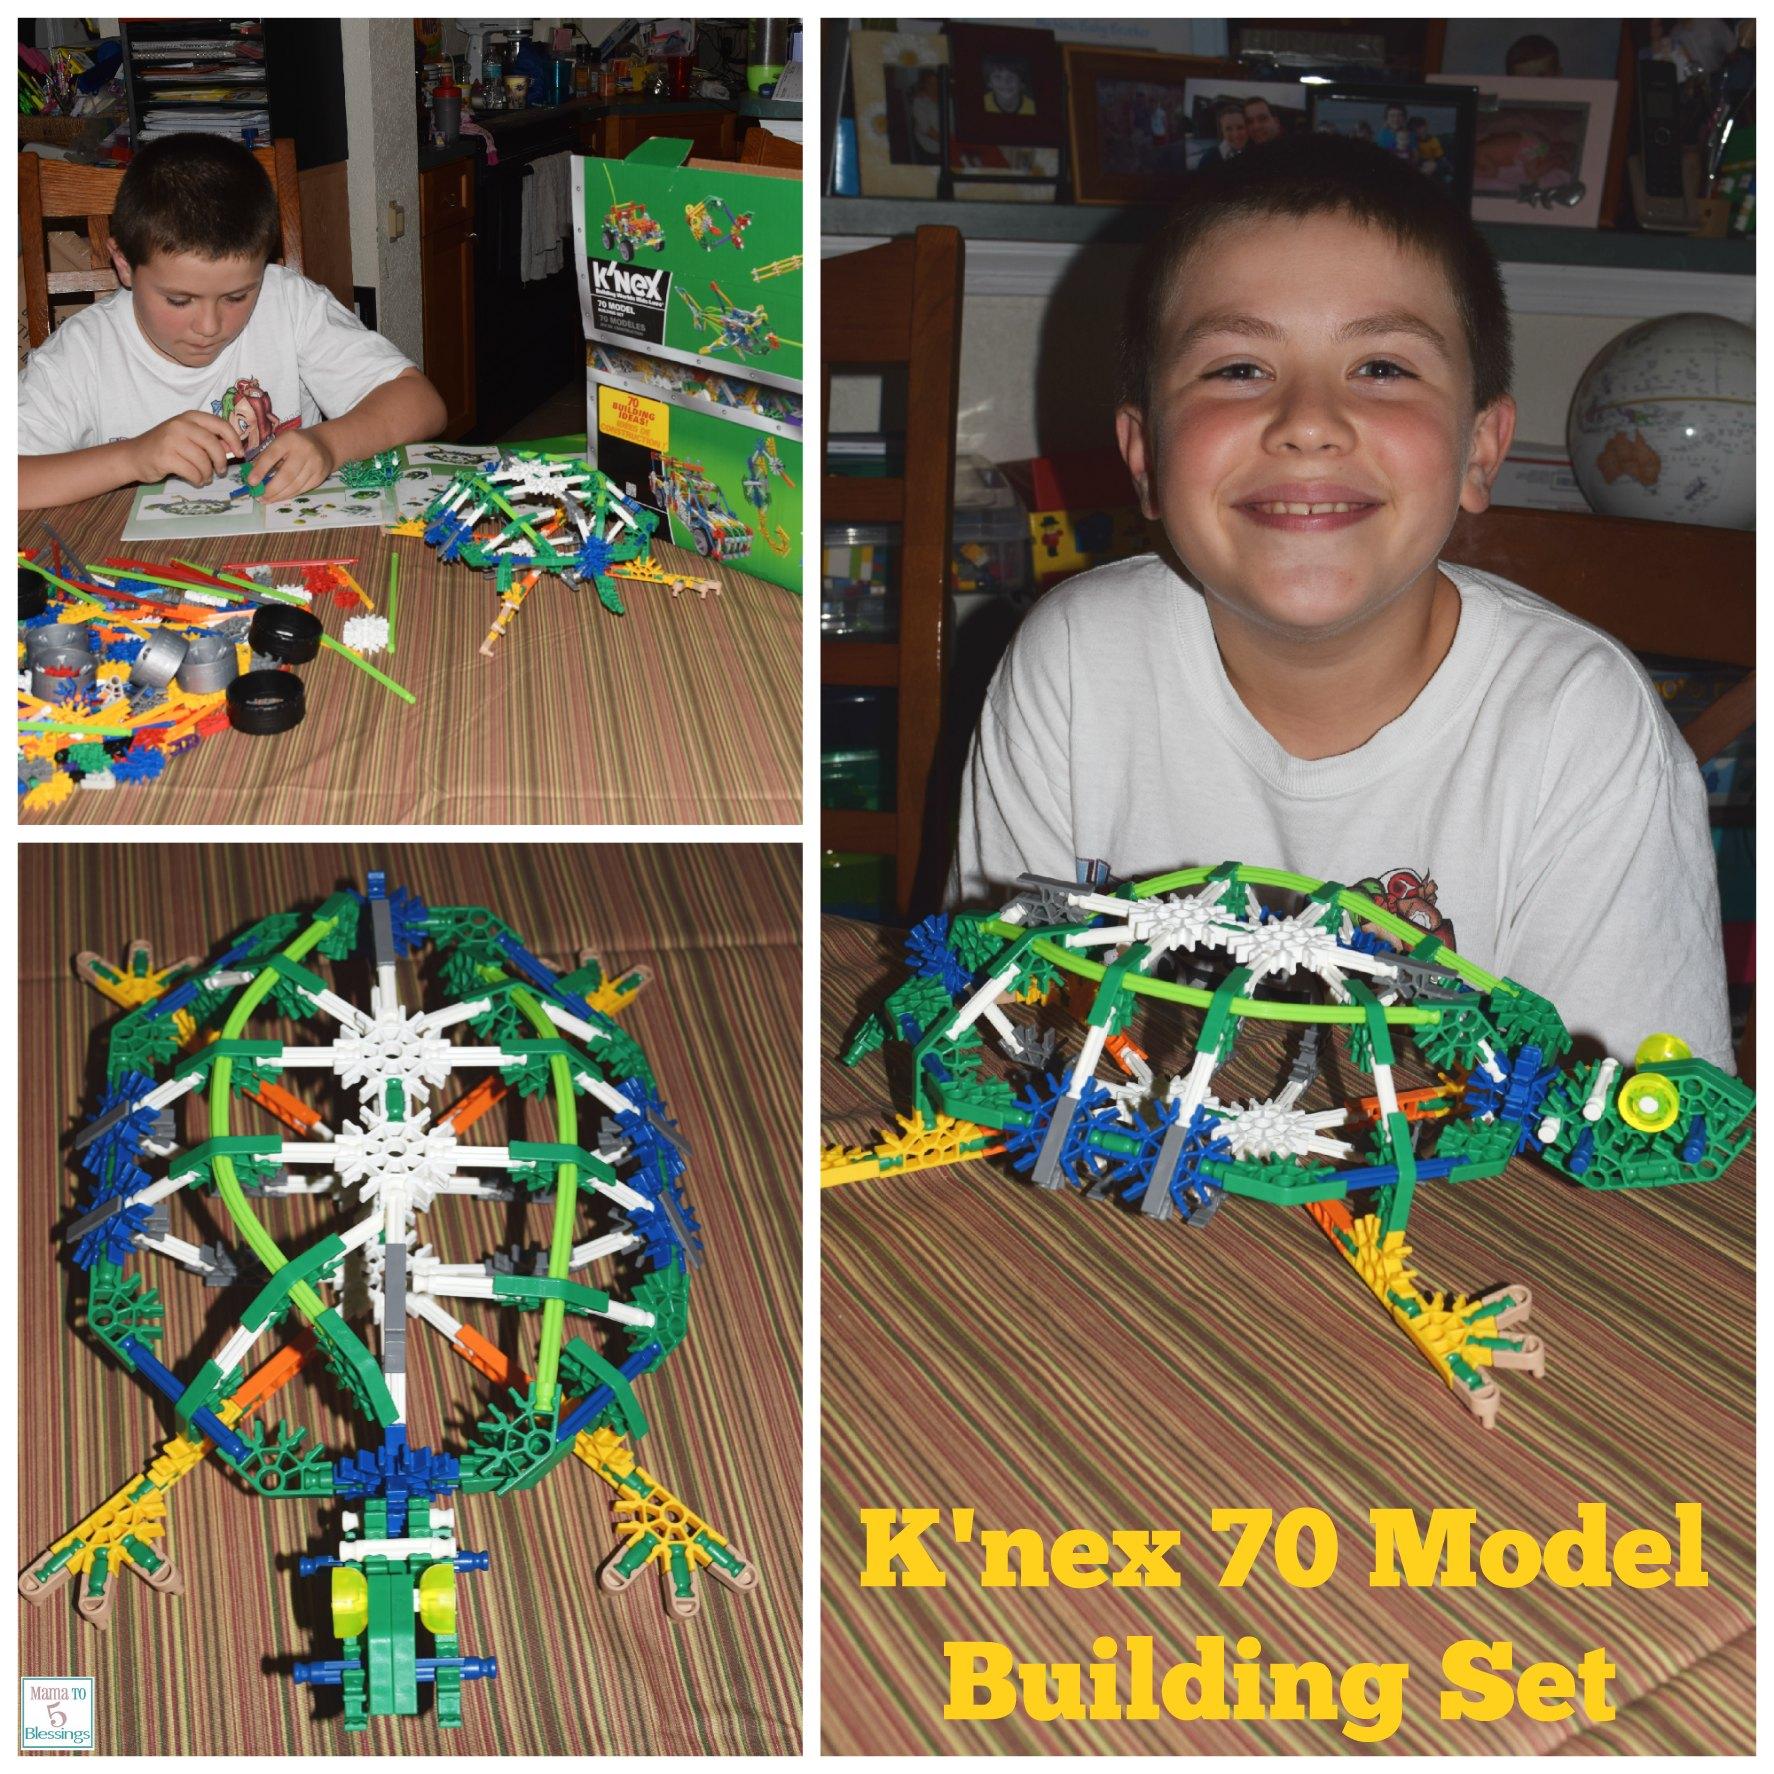 k'nex model collage